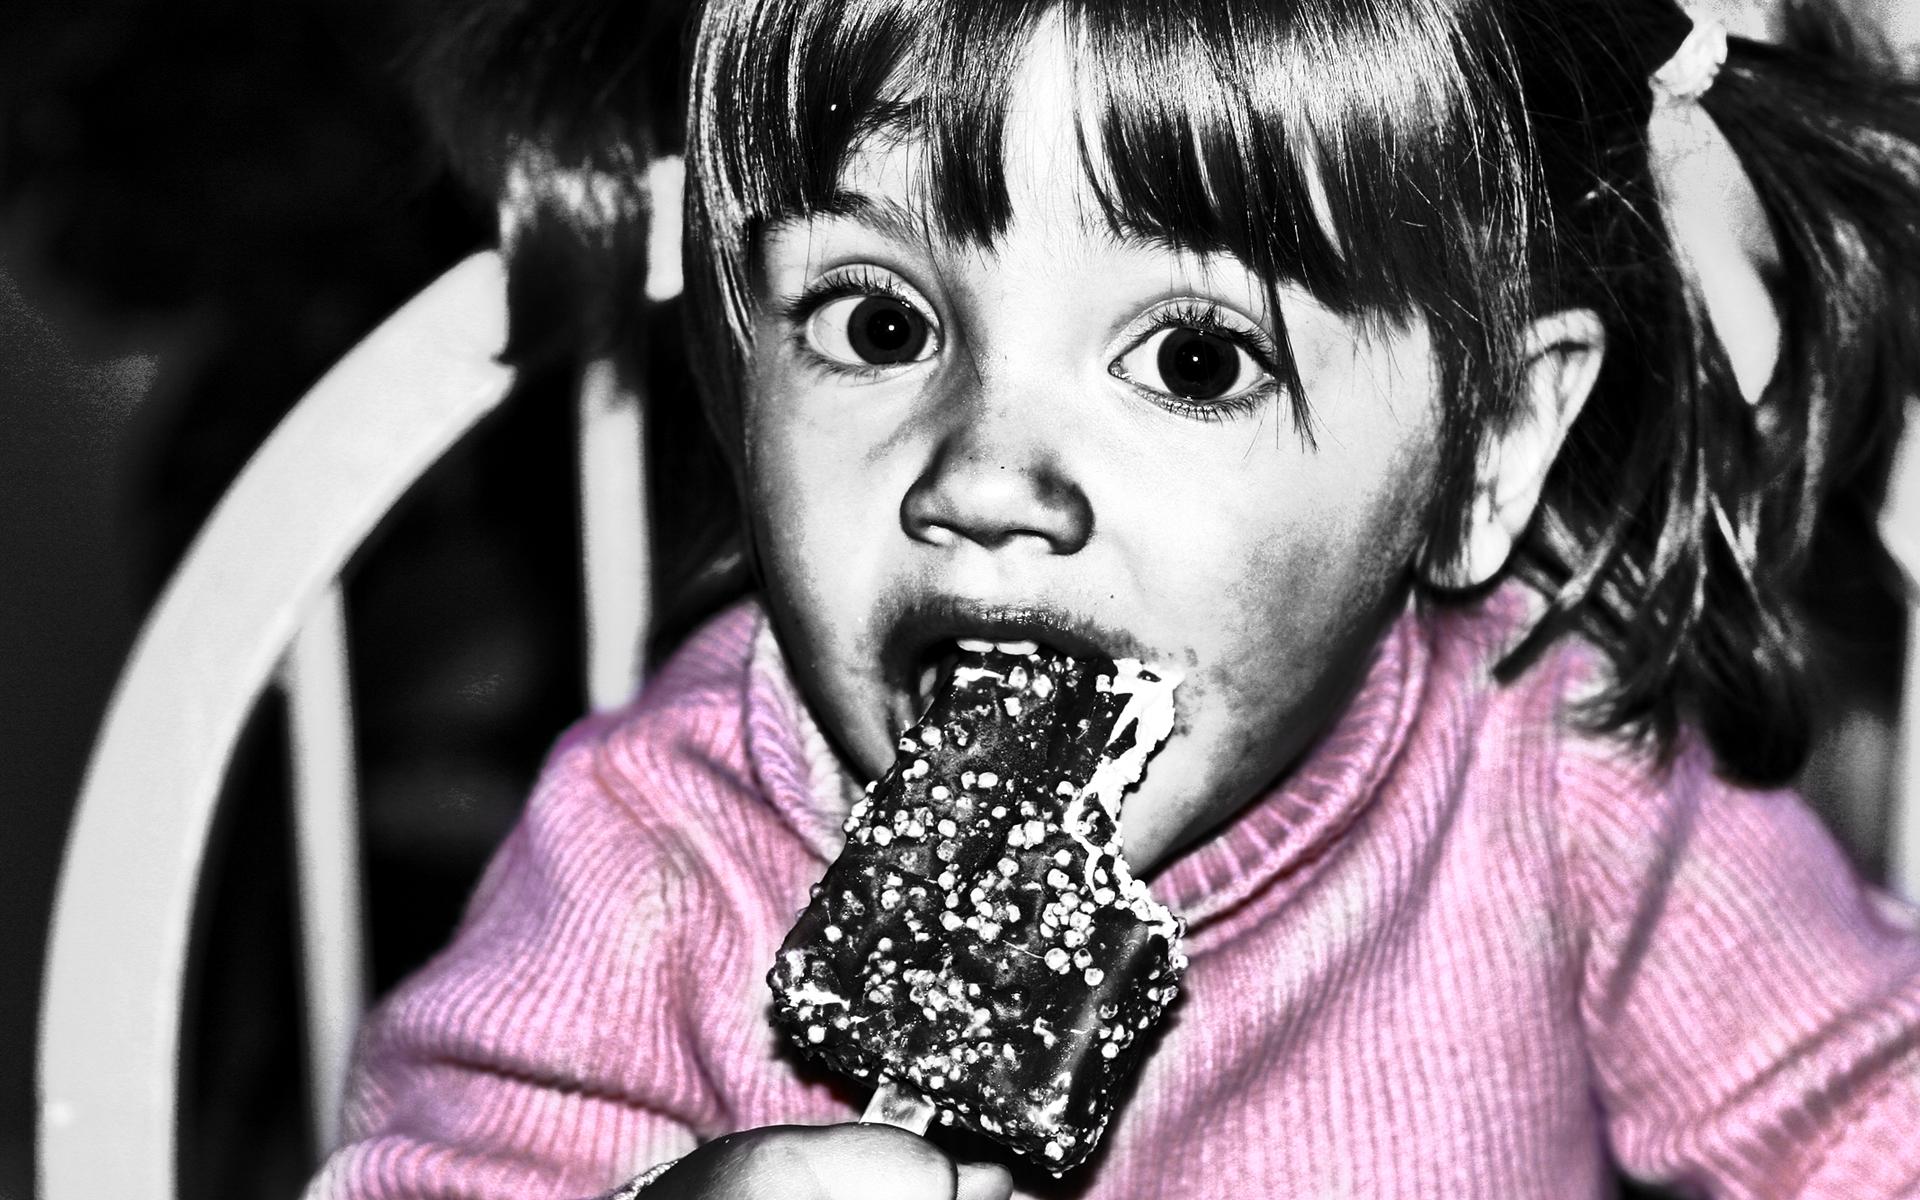 angel-eating-ice-cream